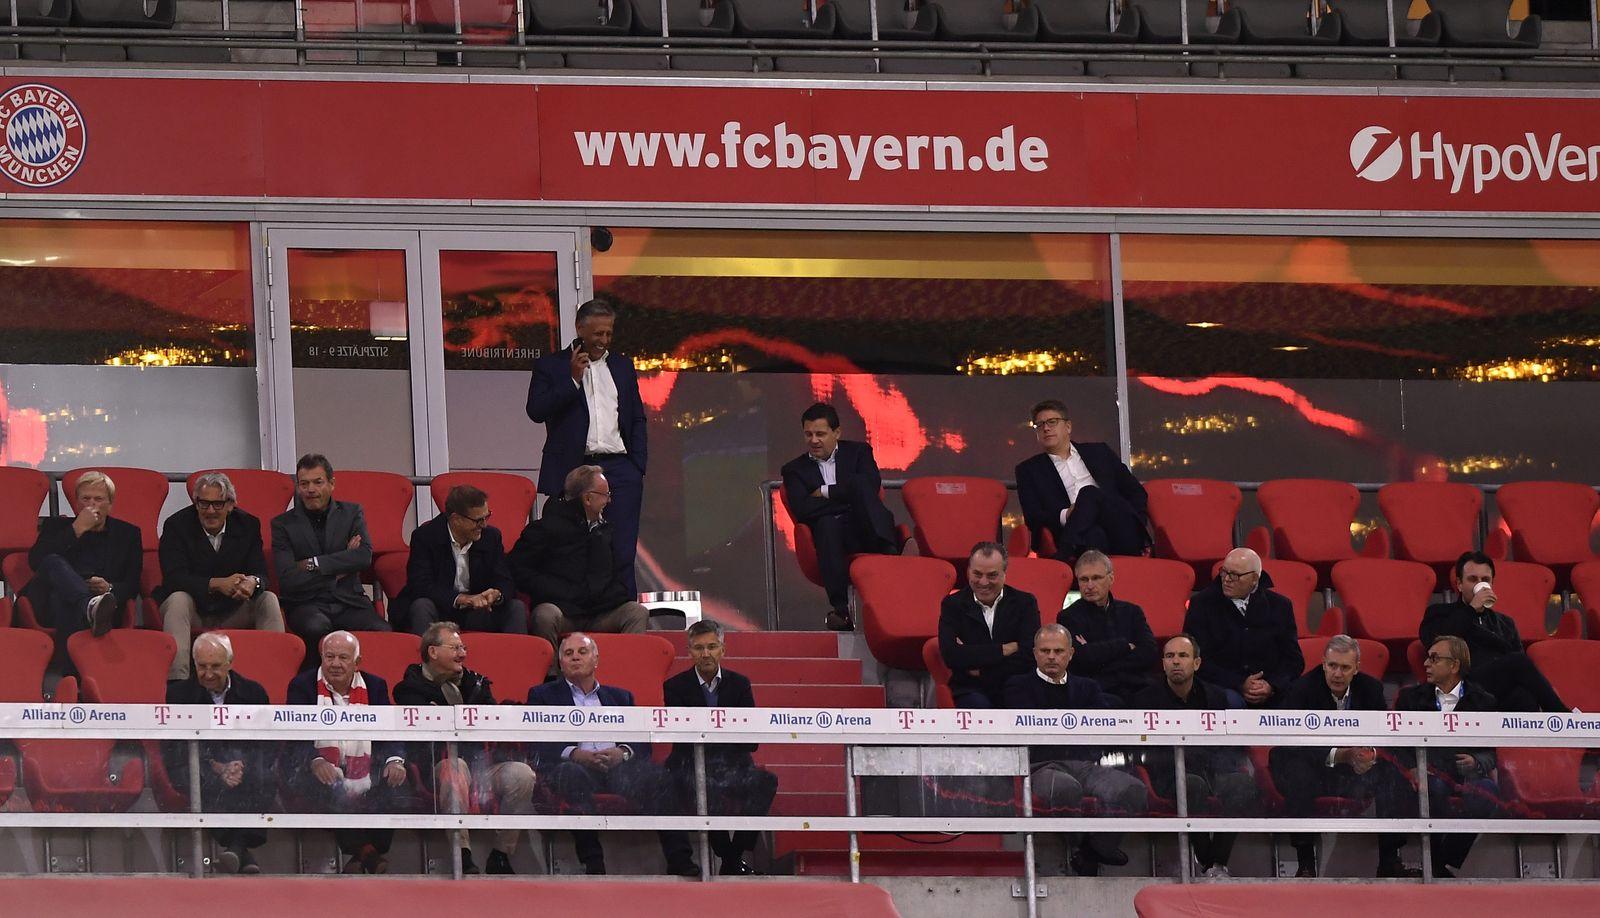 FC Bayern Munich vs FC Schalke 04, Germany - 18 Sep 2020